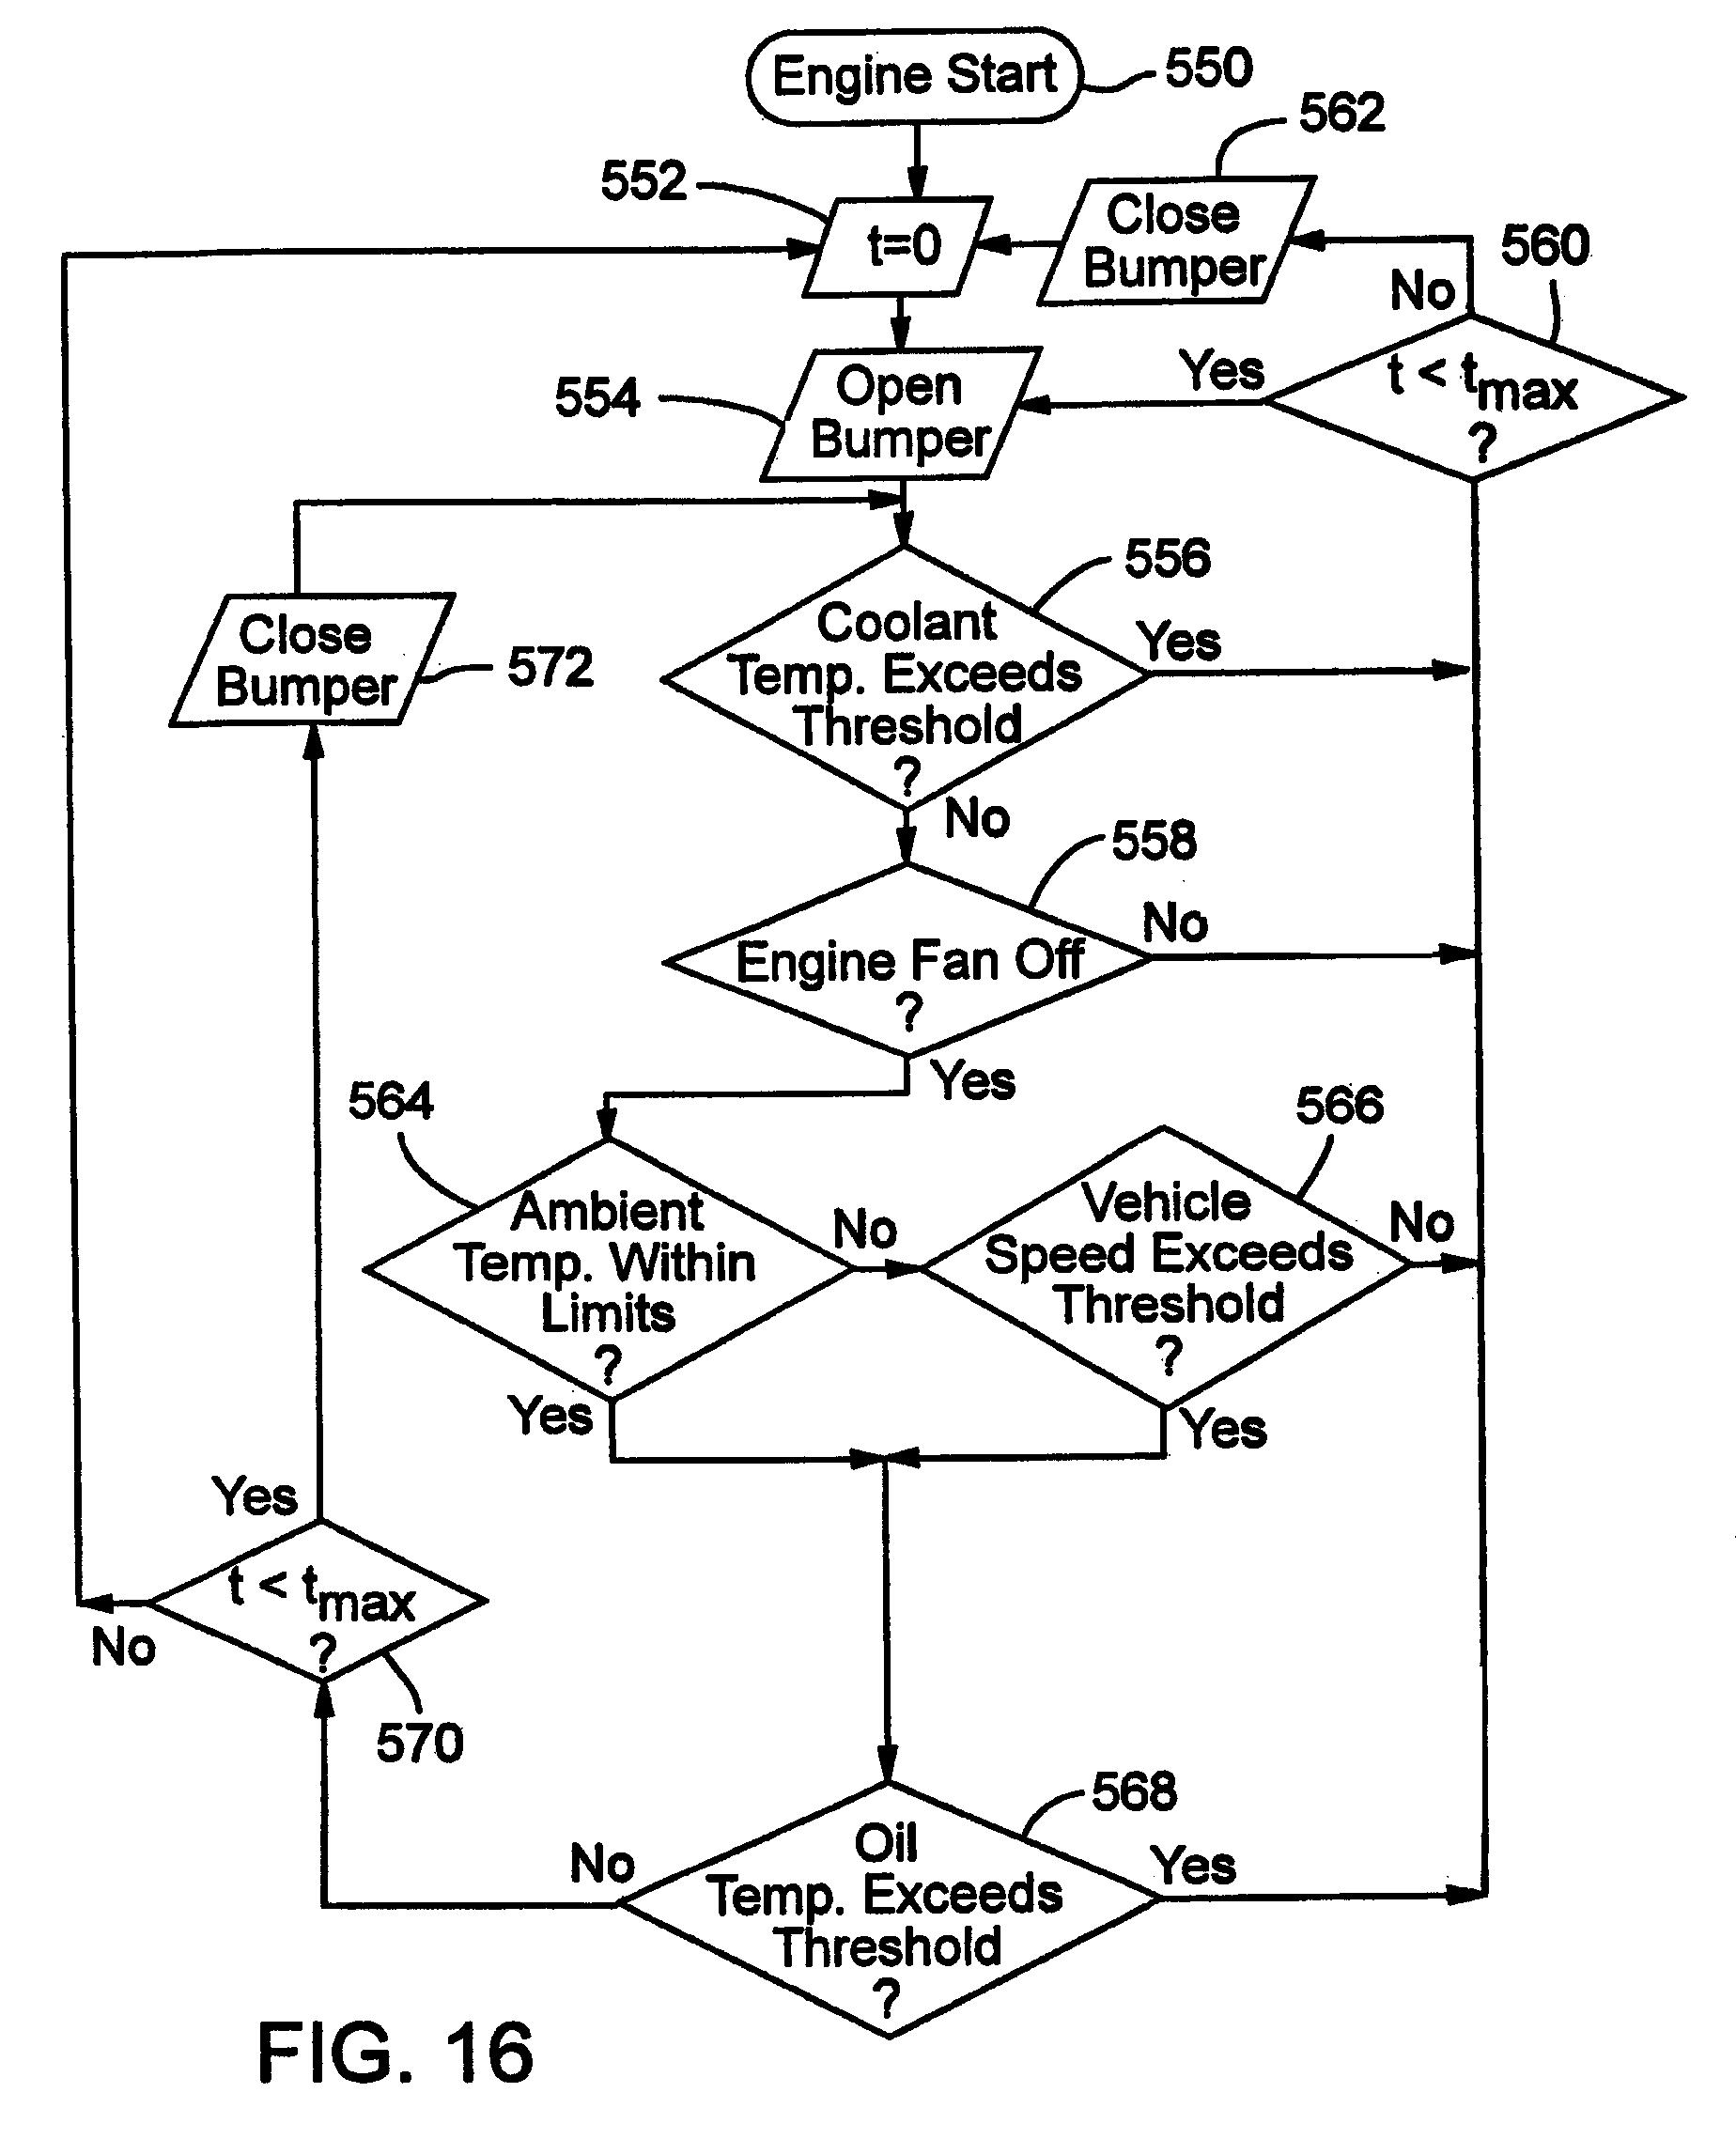 fuse panel diagram f250 1999 wiring diagram database Ford F-250 Fuse Box Diagram 1976 ford f 250 fuse box wiring diagram database ford f 350 fuse panel diagram